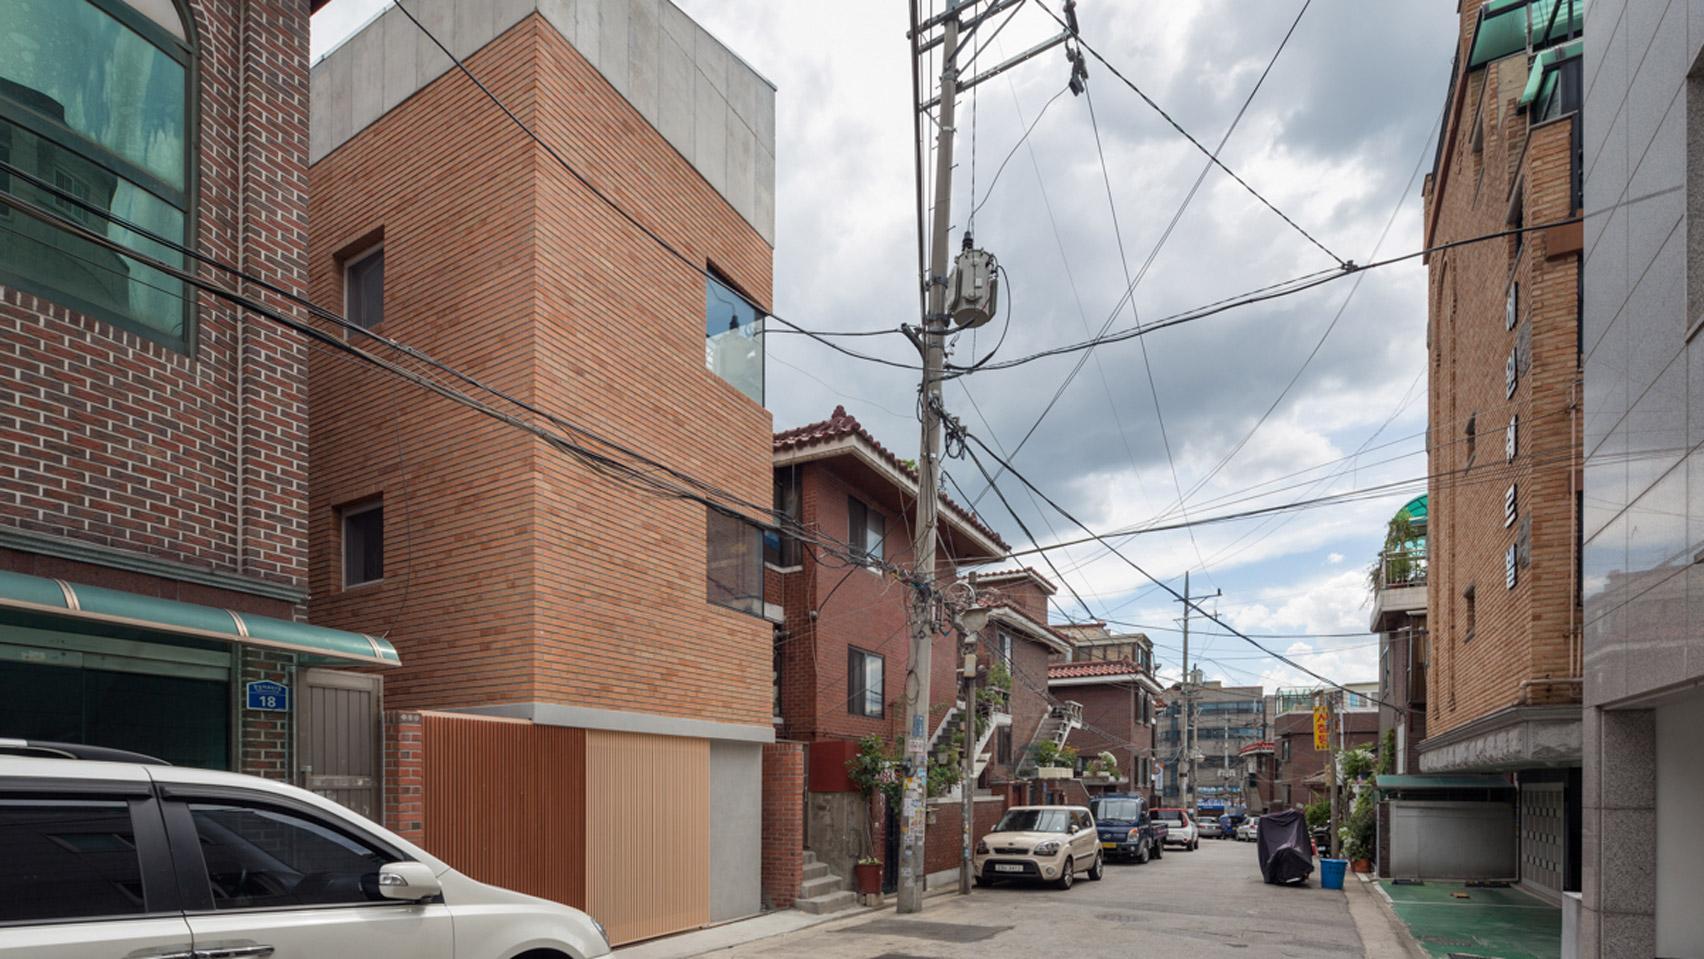 grown-house-fhhh-friends-architecture-residential-seoul-south-korea_dezeen_hero